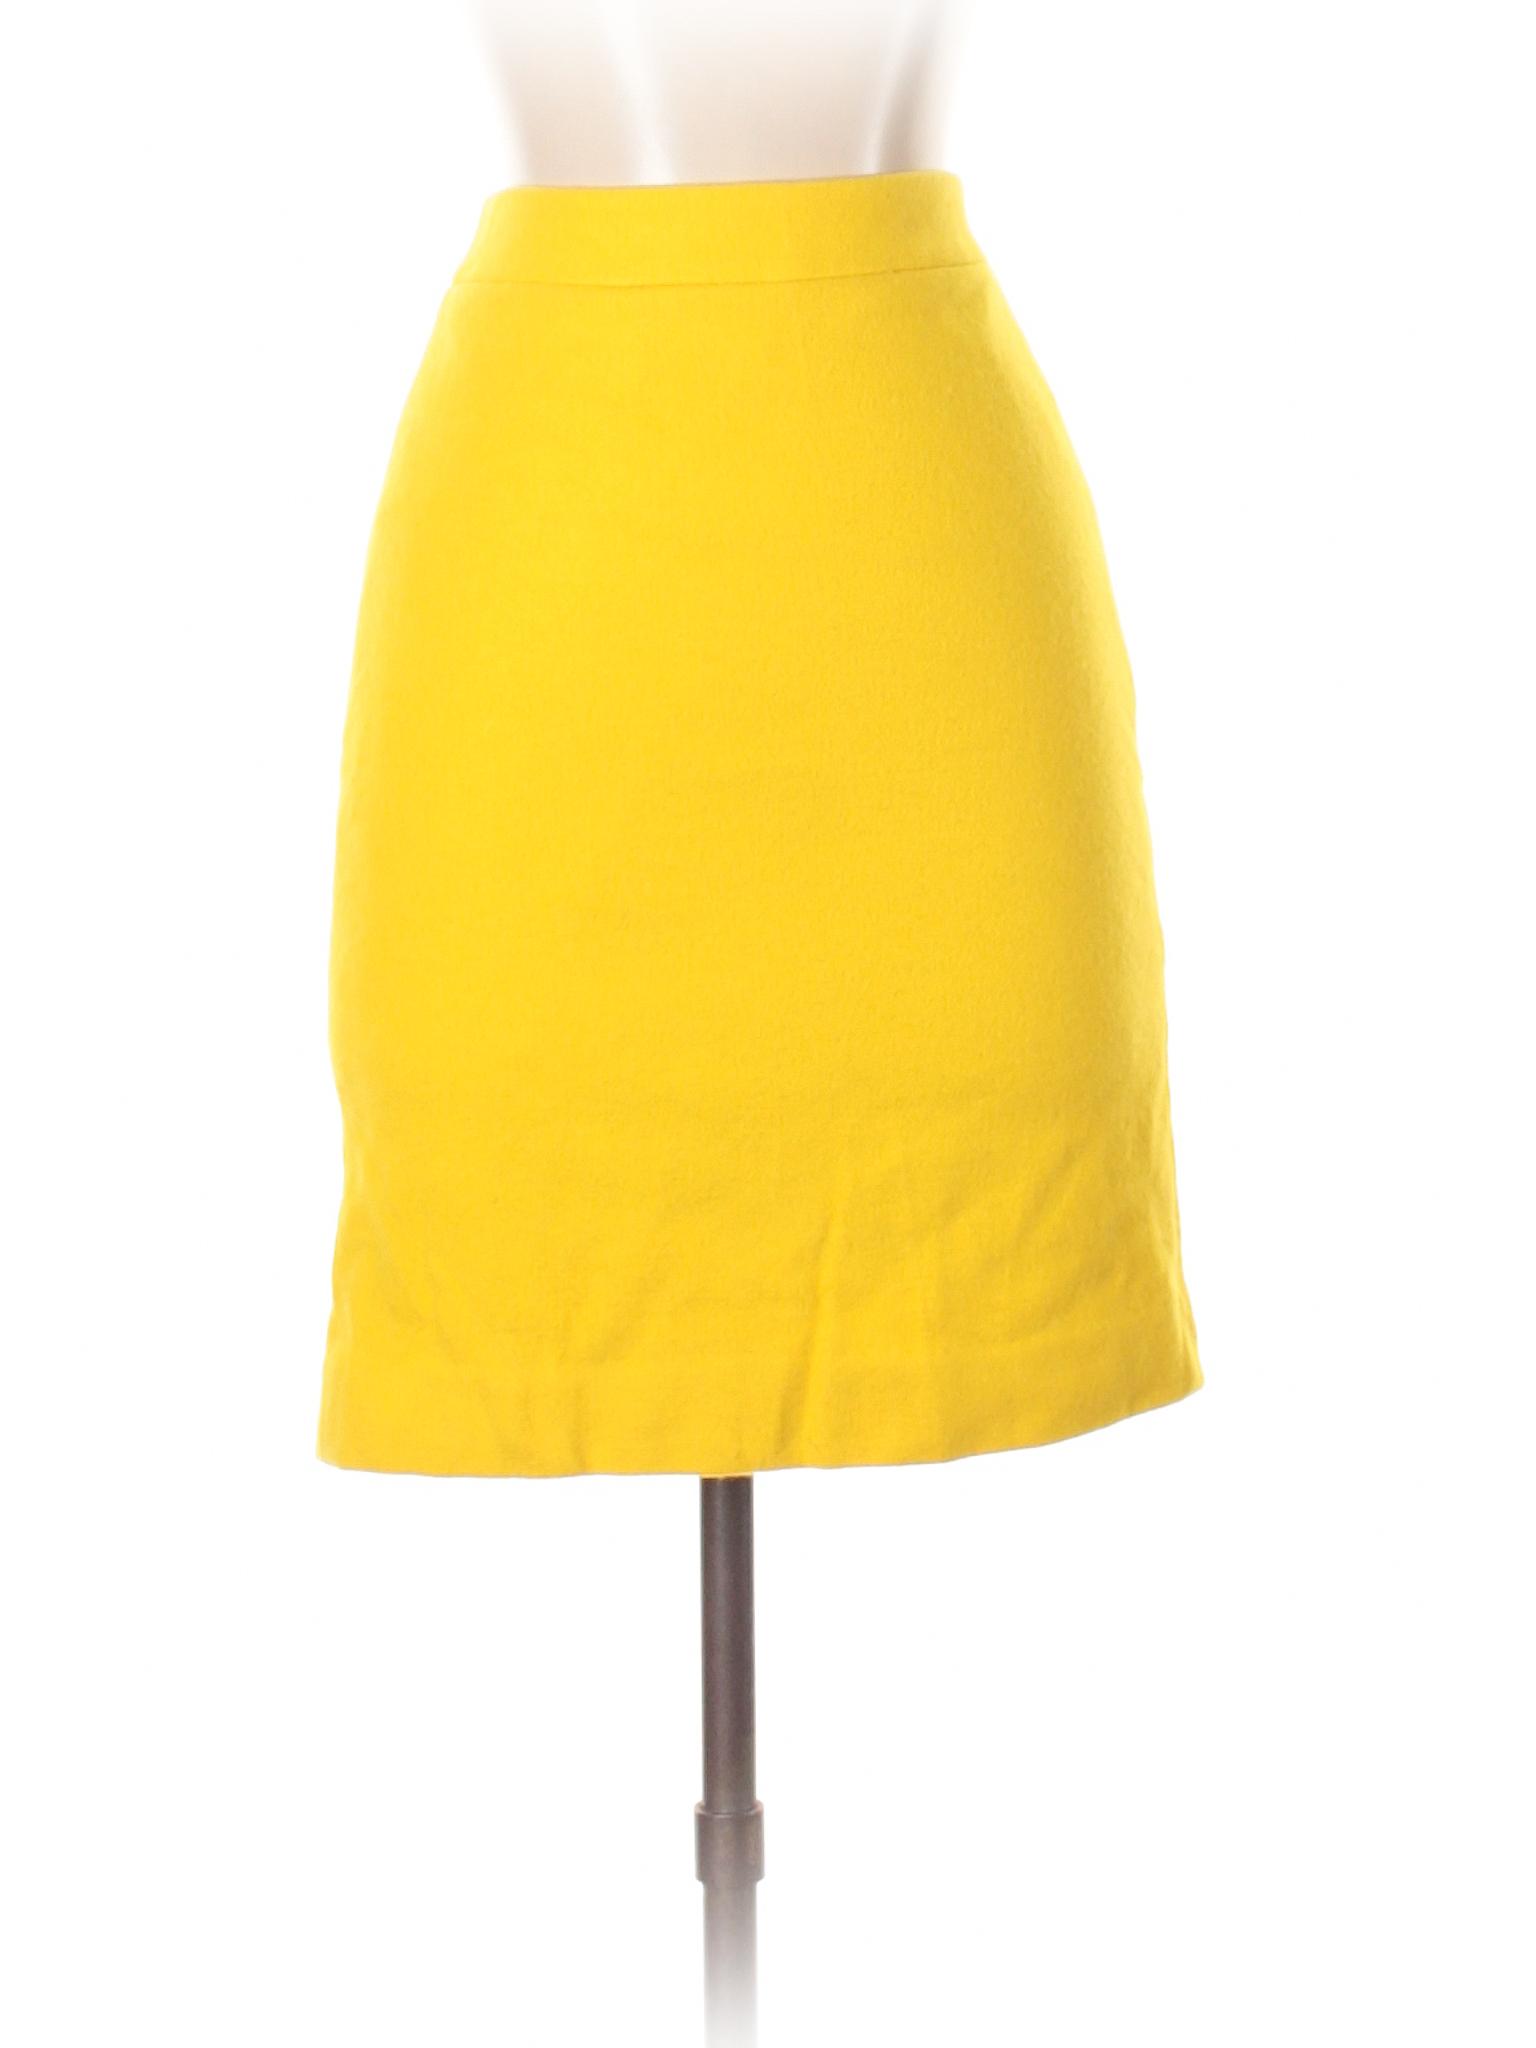 Skirt Leisure Wool Store Crew winter J Factory c1qUz0